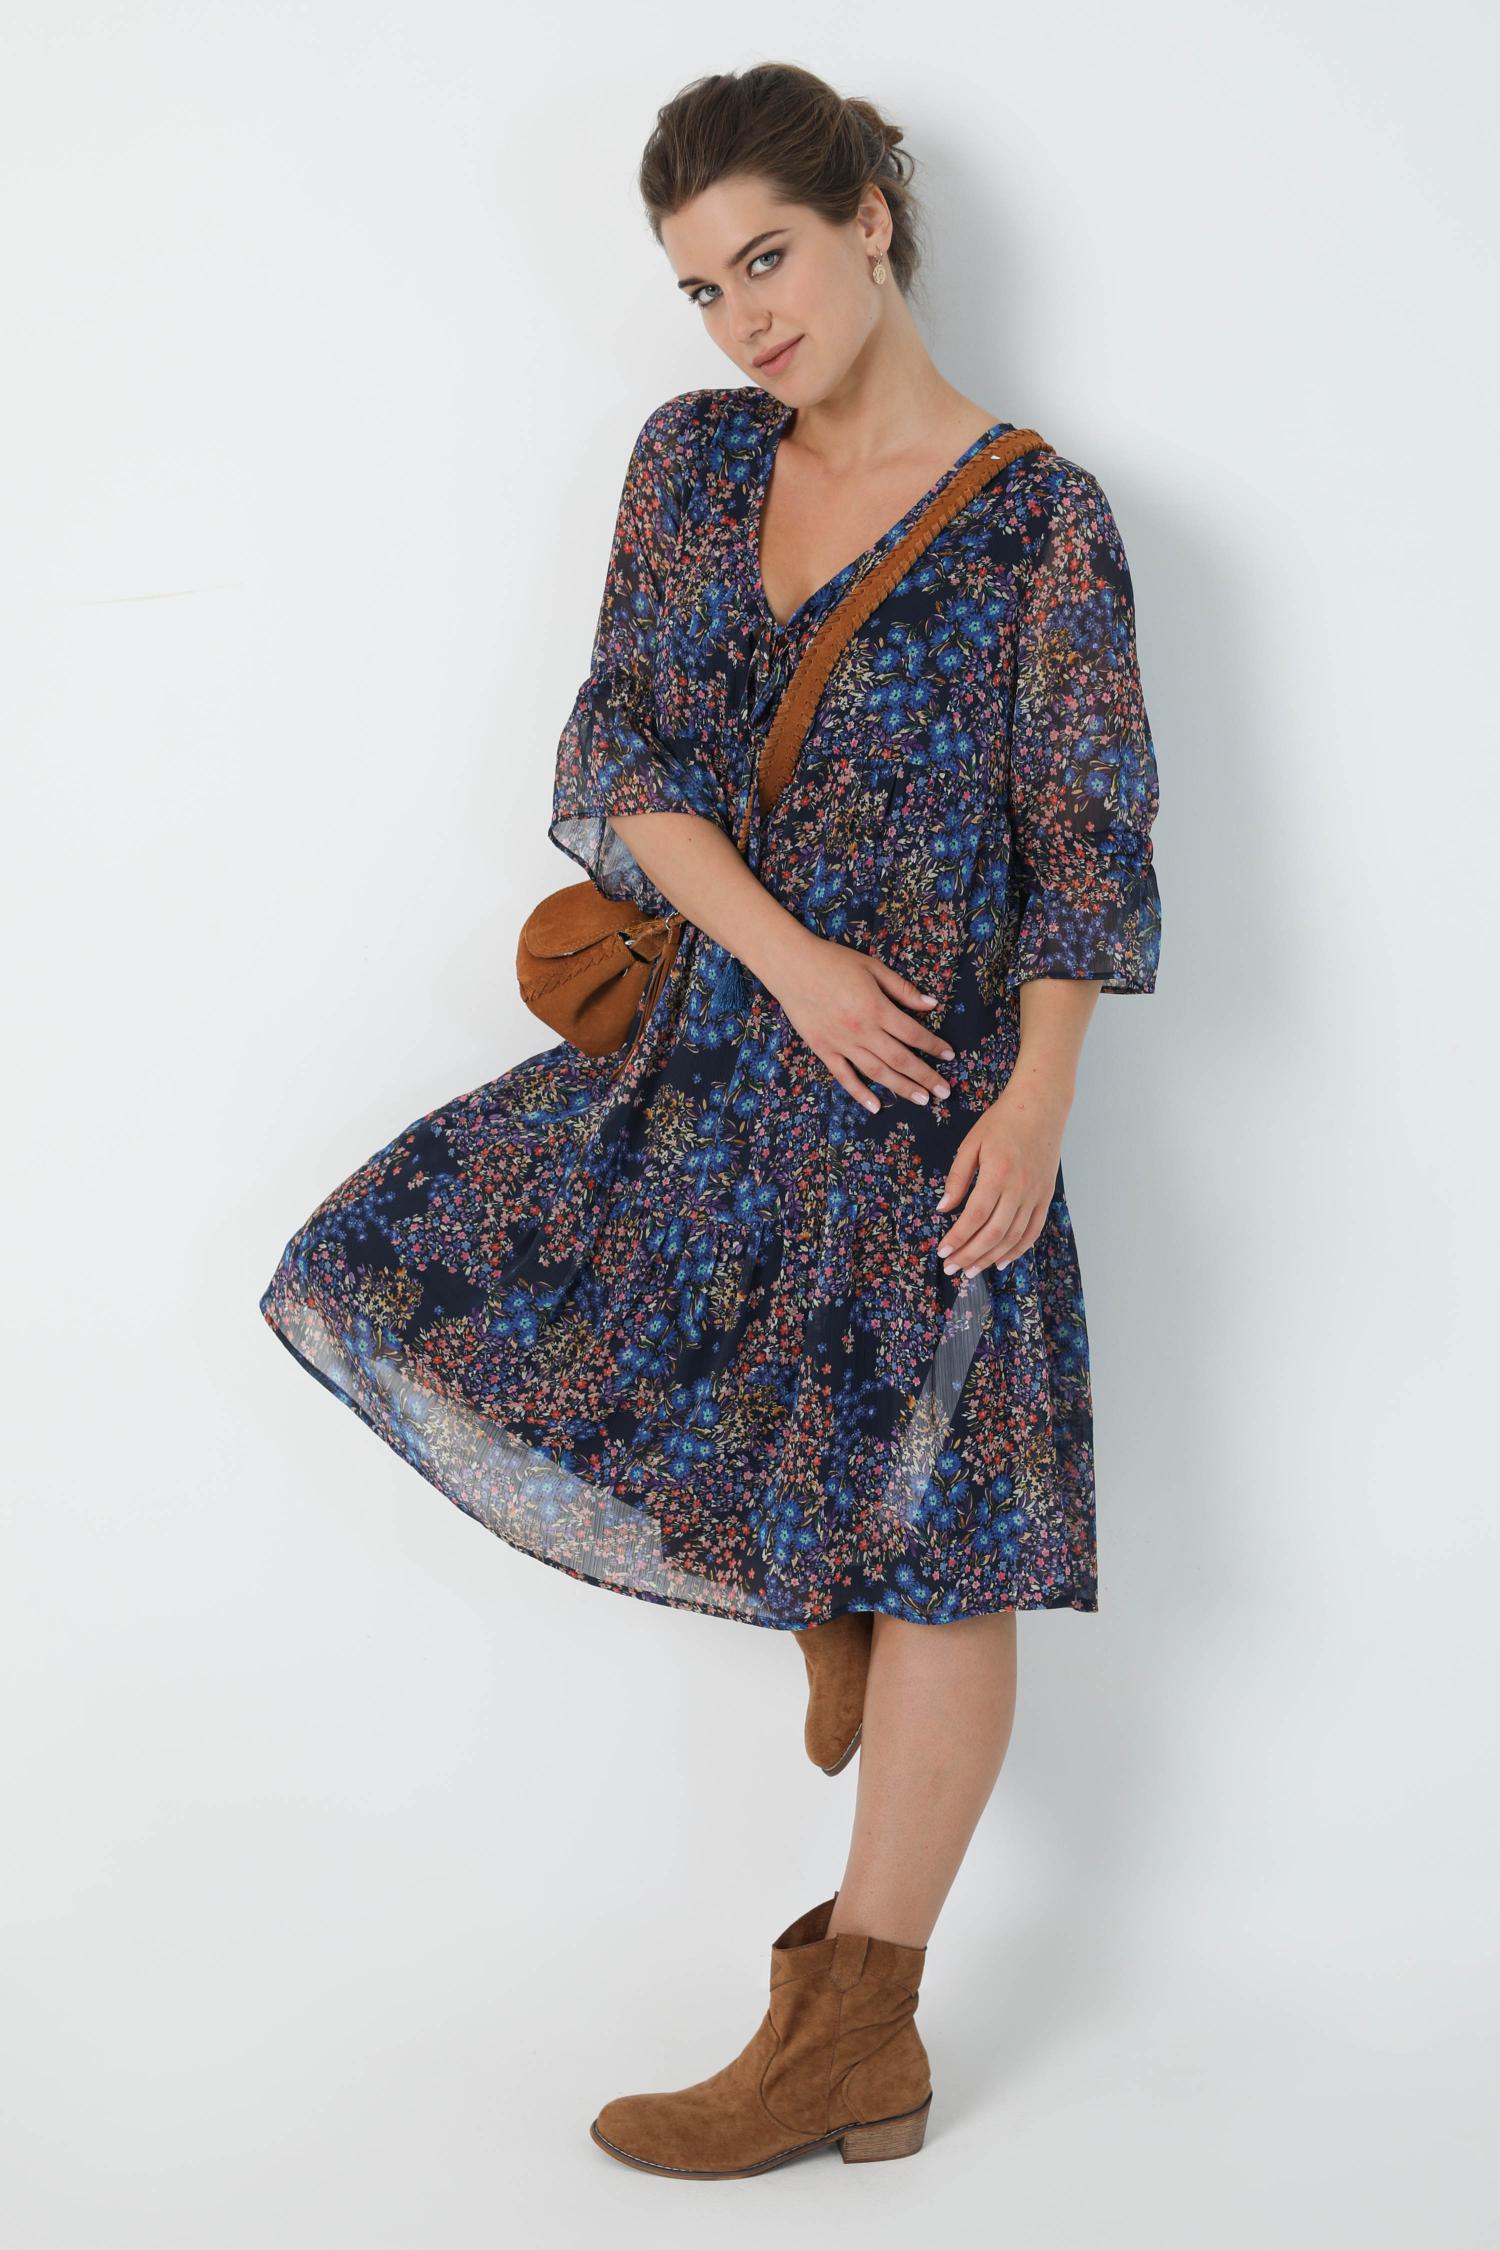 Bohemian style mid-length dress in veil printed with oeko-tex fabric